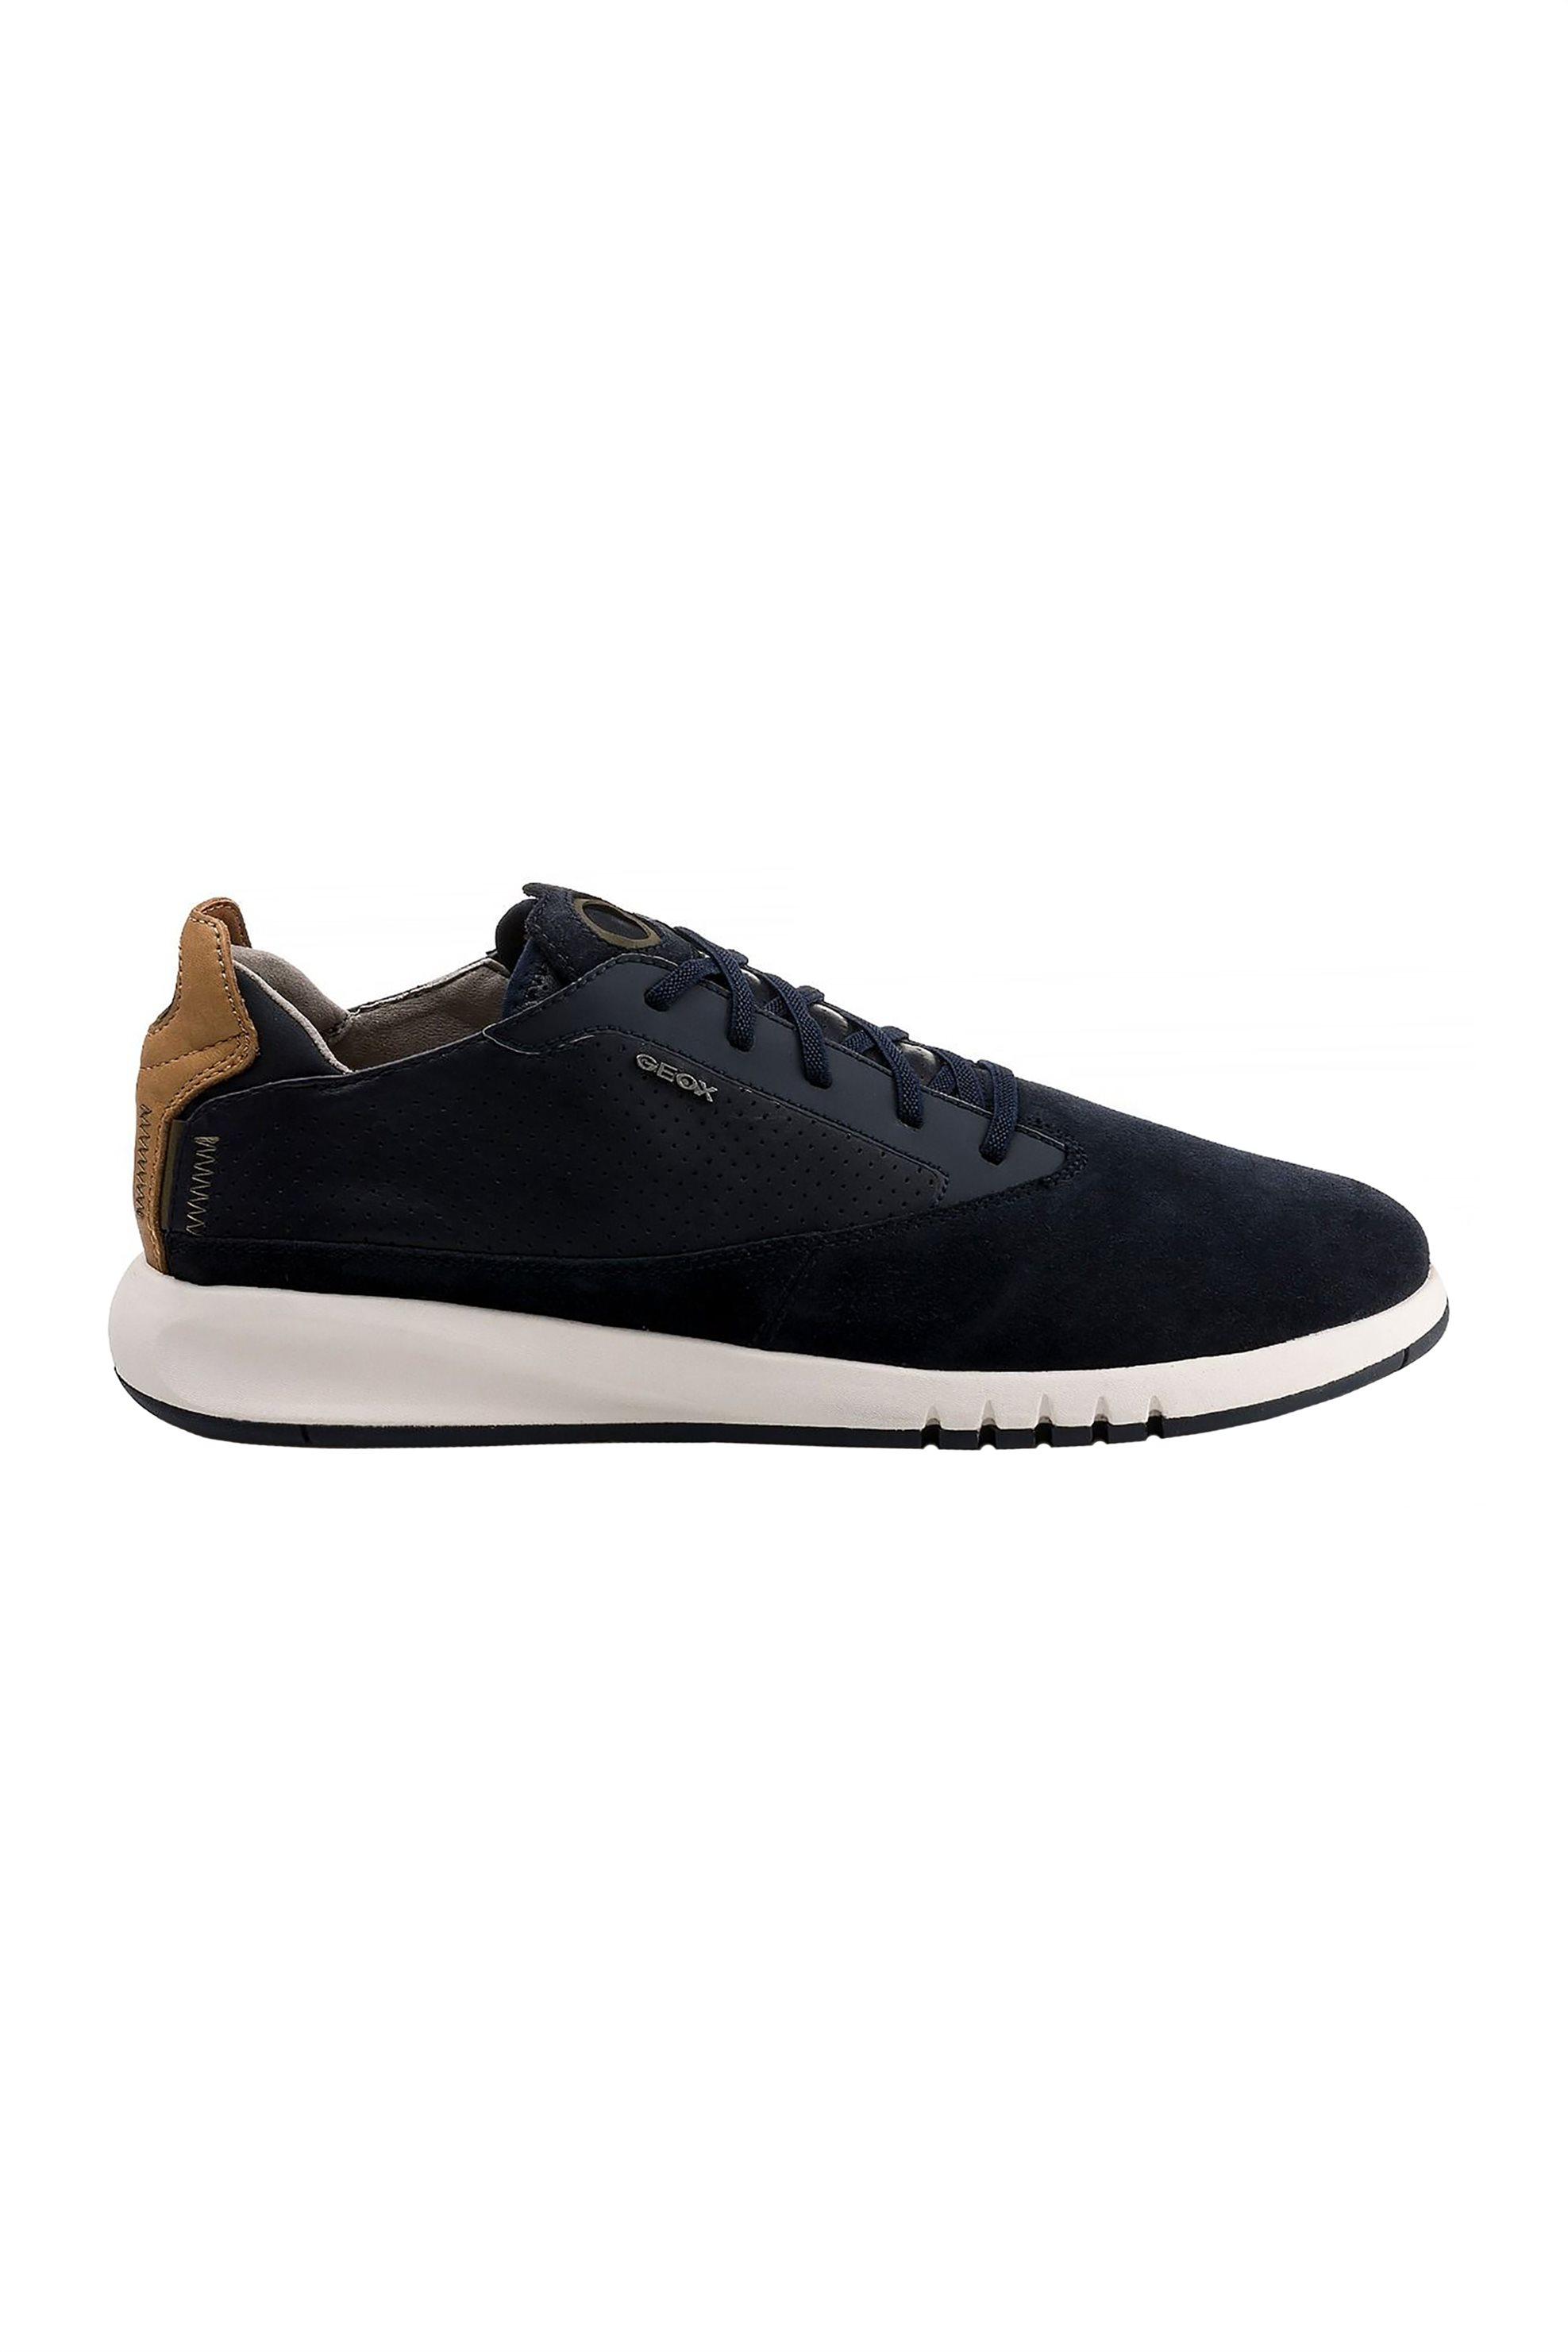 "Geox ανδρικά sneakers με ελαστικά κορδόνια ""Aerantis"" – U927FA – Μπλε Σκούρο"